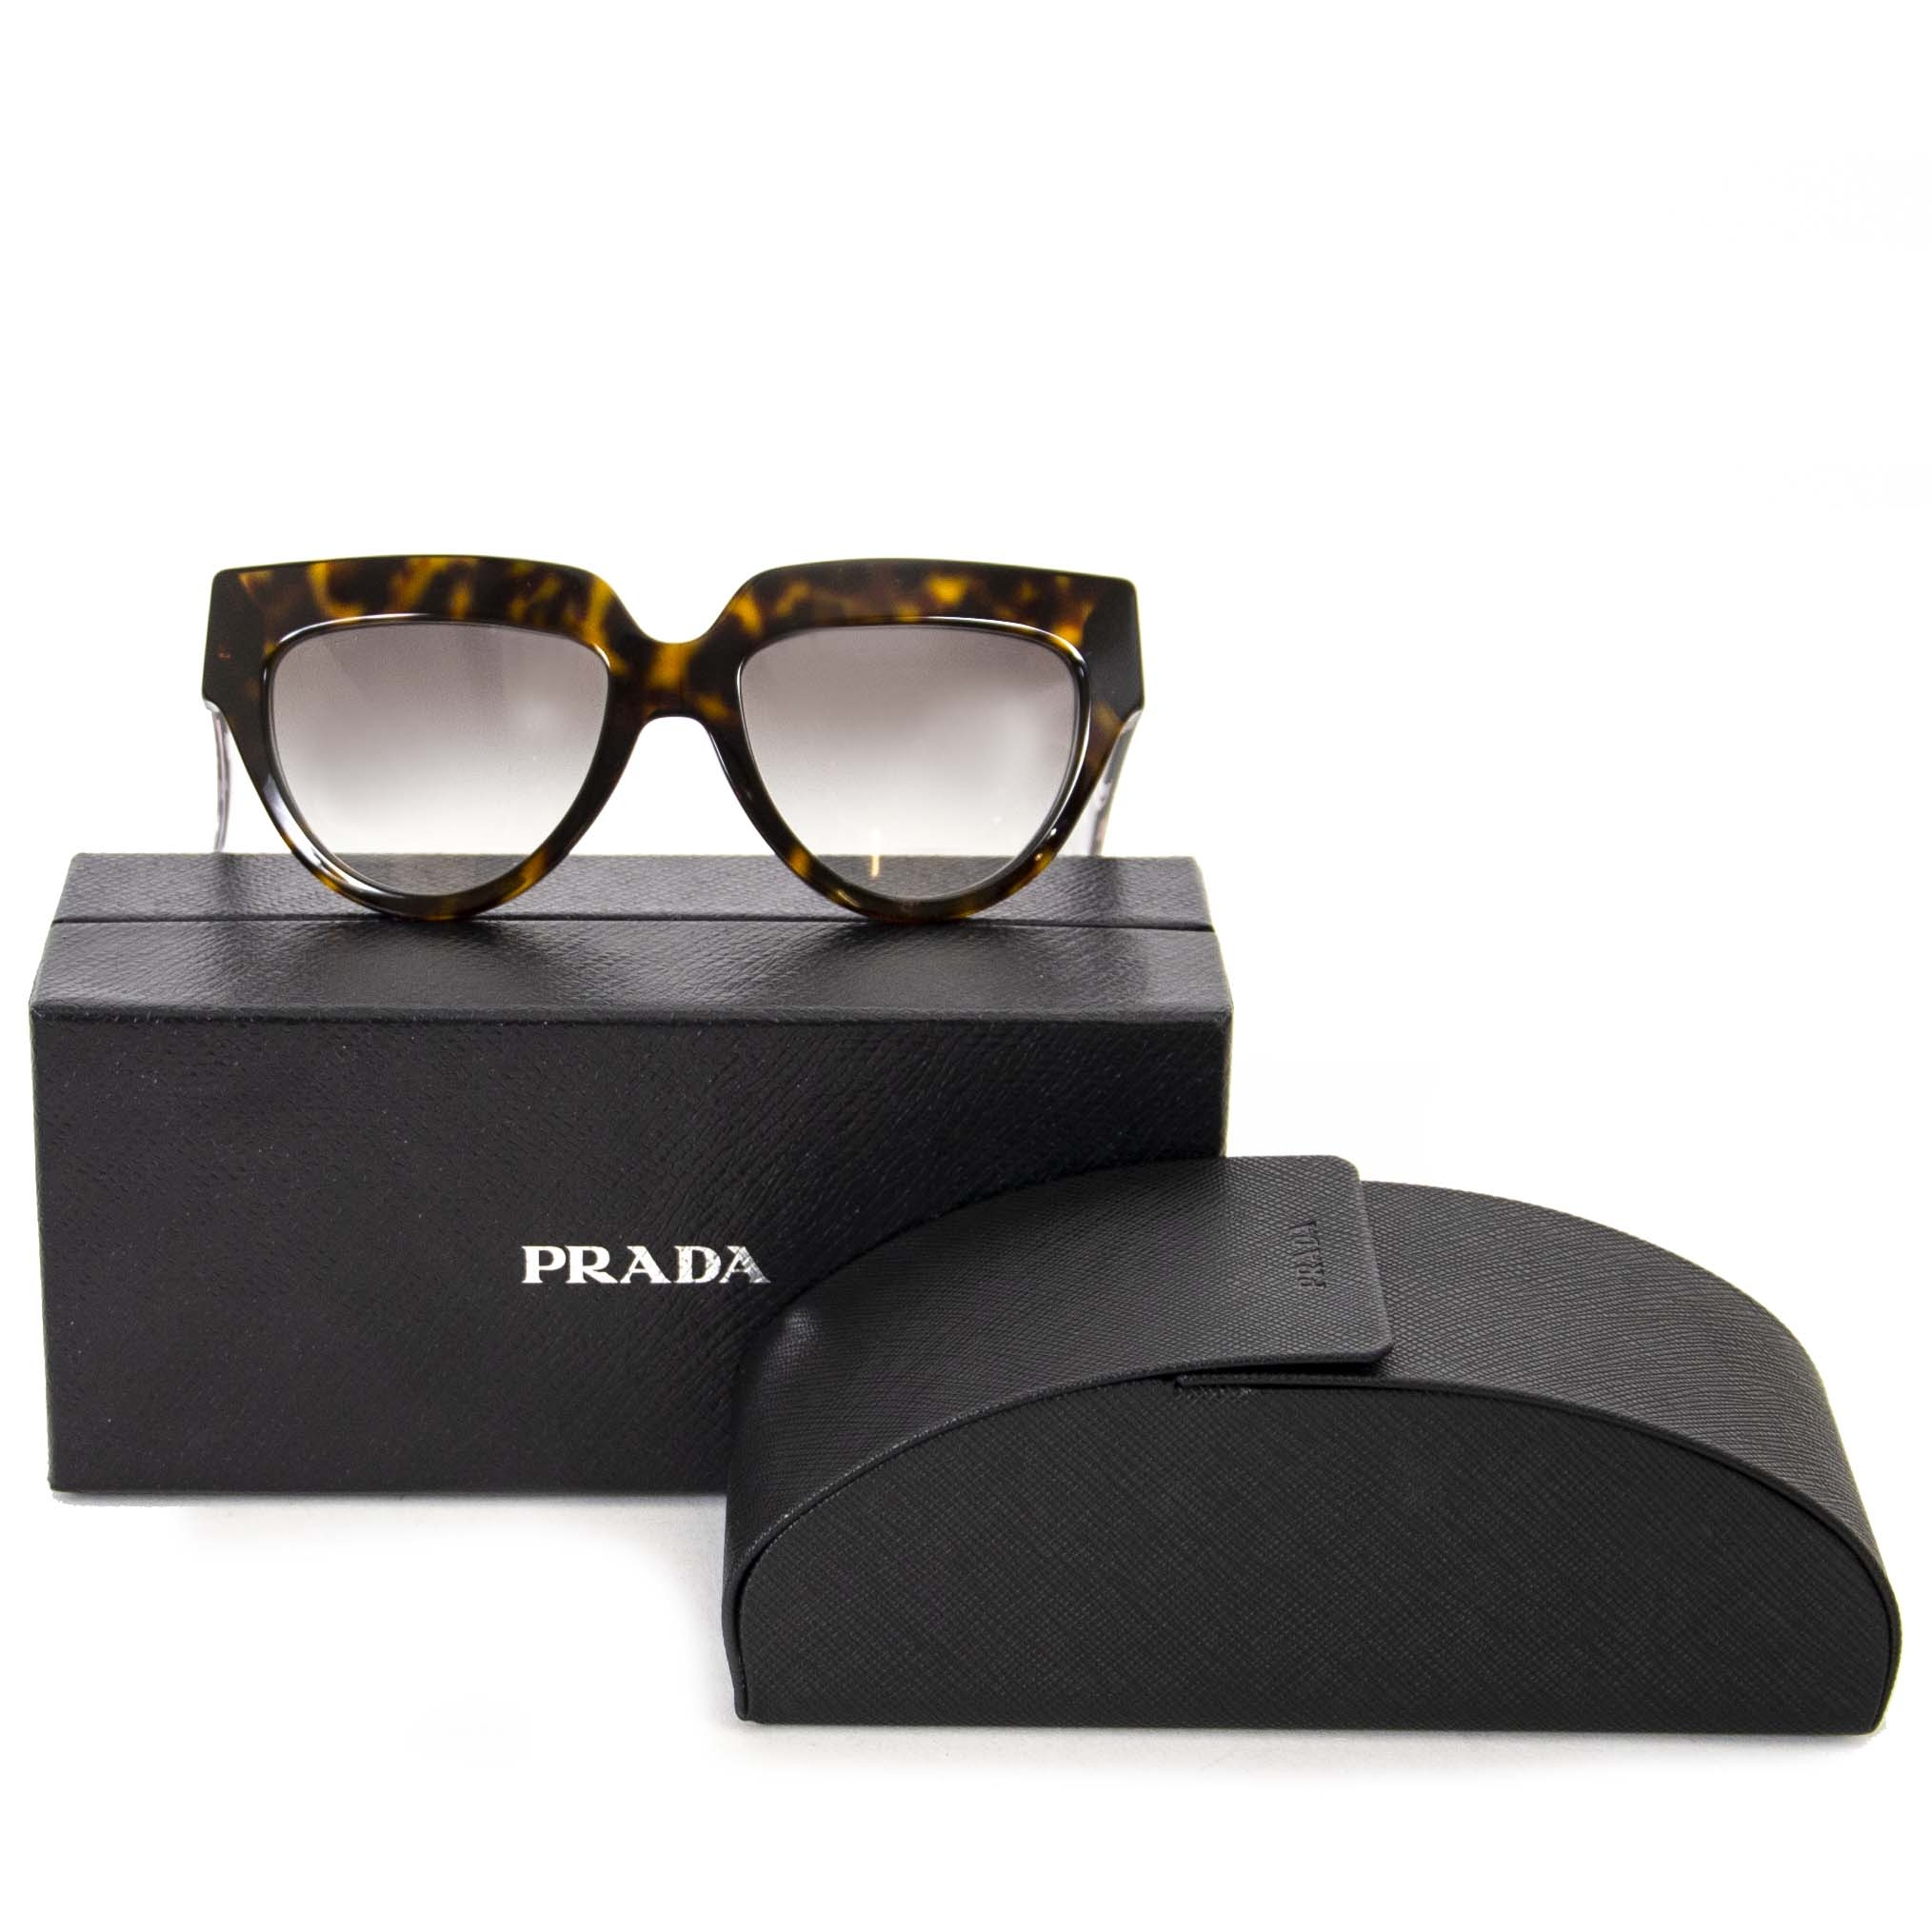 Prada Poeme Black And Tortoise Flower Sunglasses now for sale at labellov vintage fashion webshop belgium